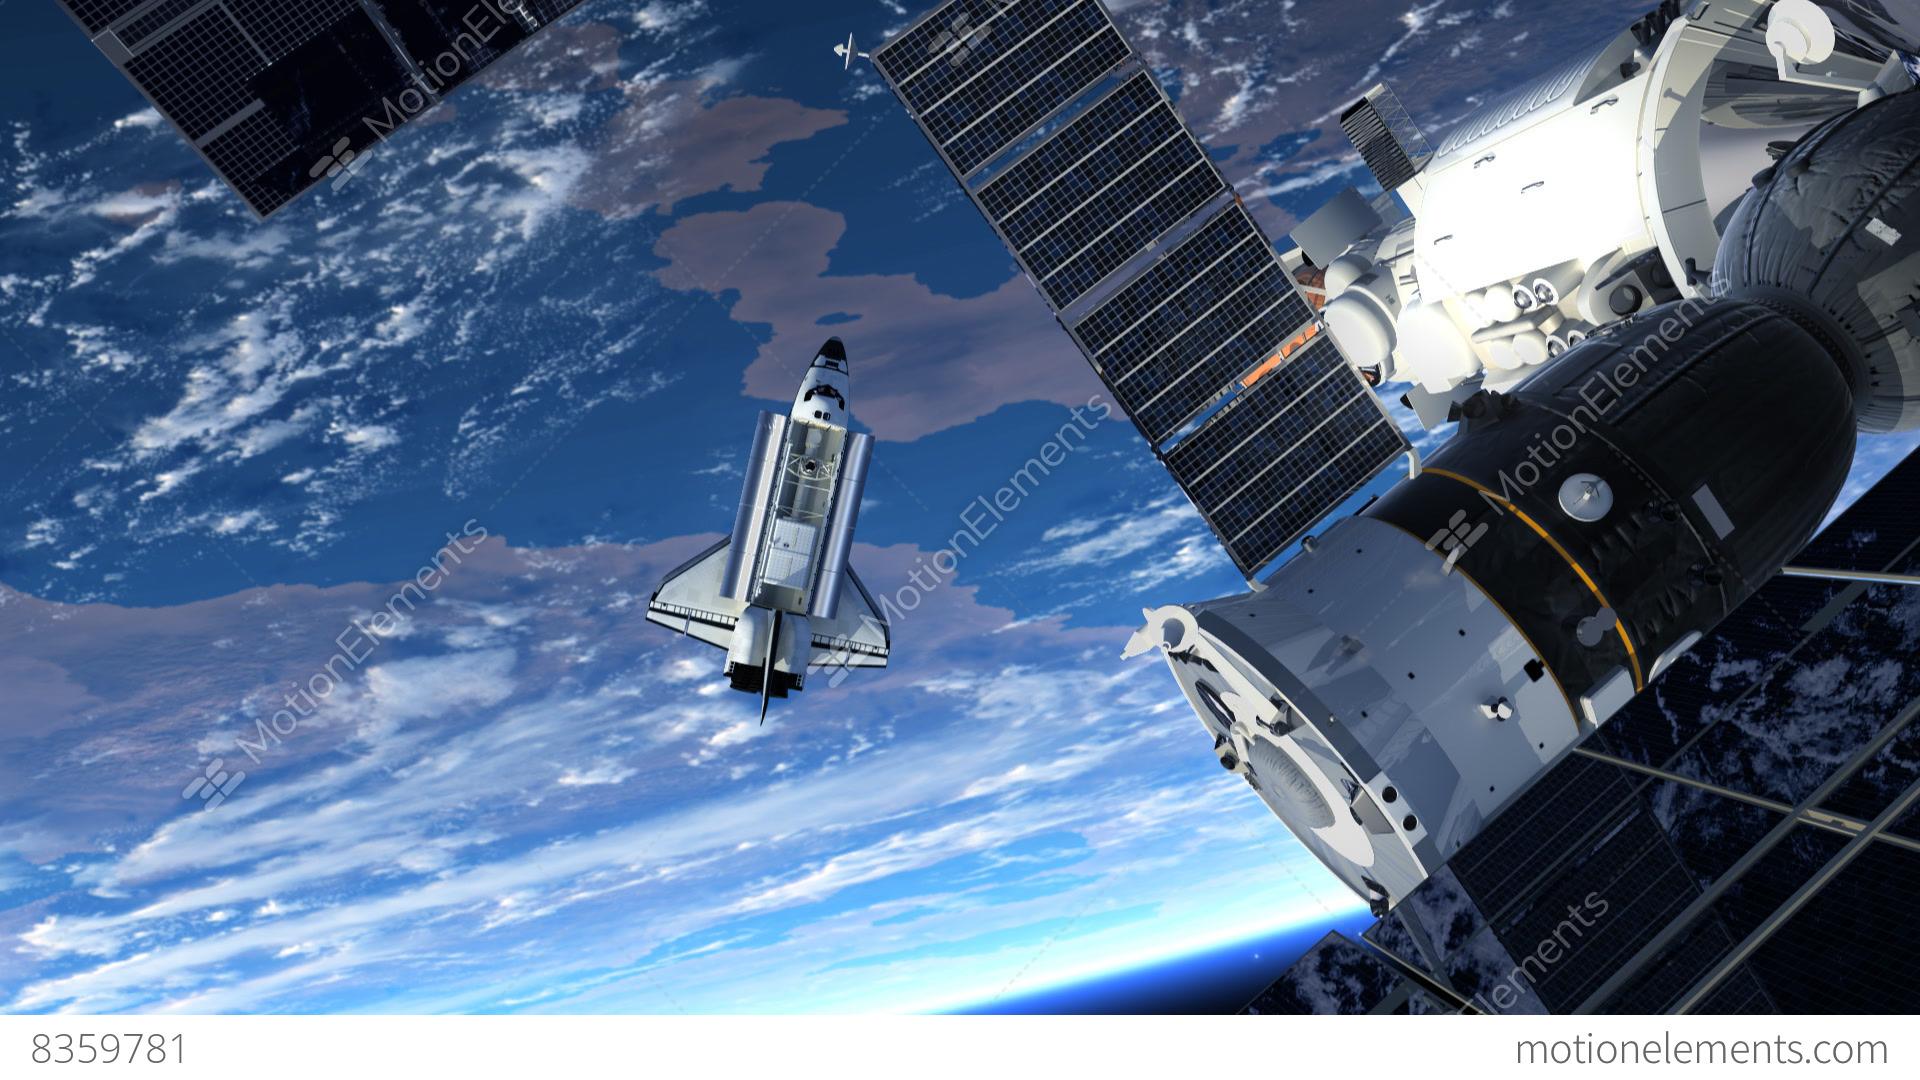 astronaut orbiting space station - photo #2